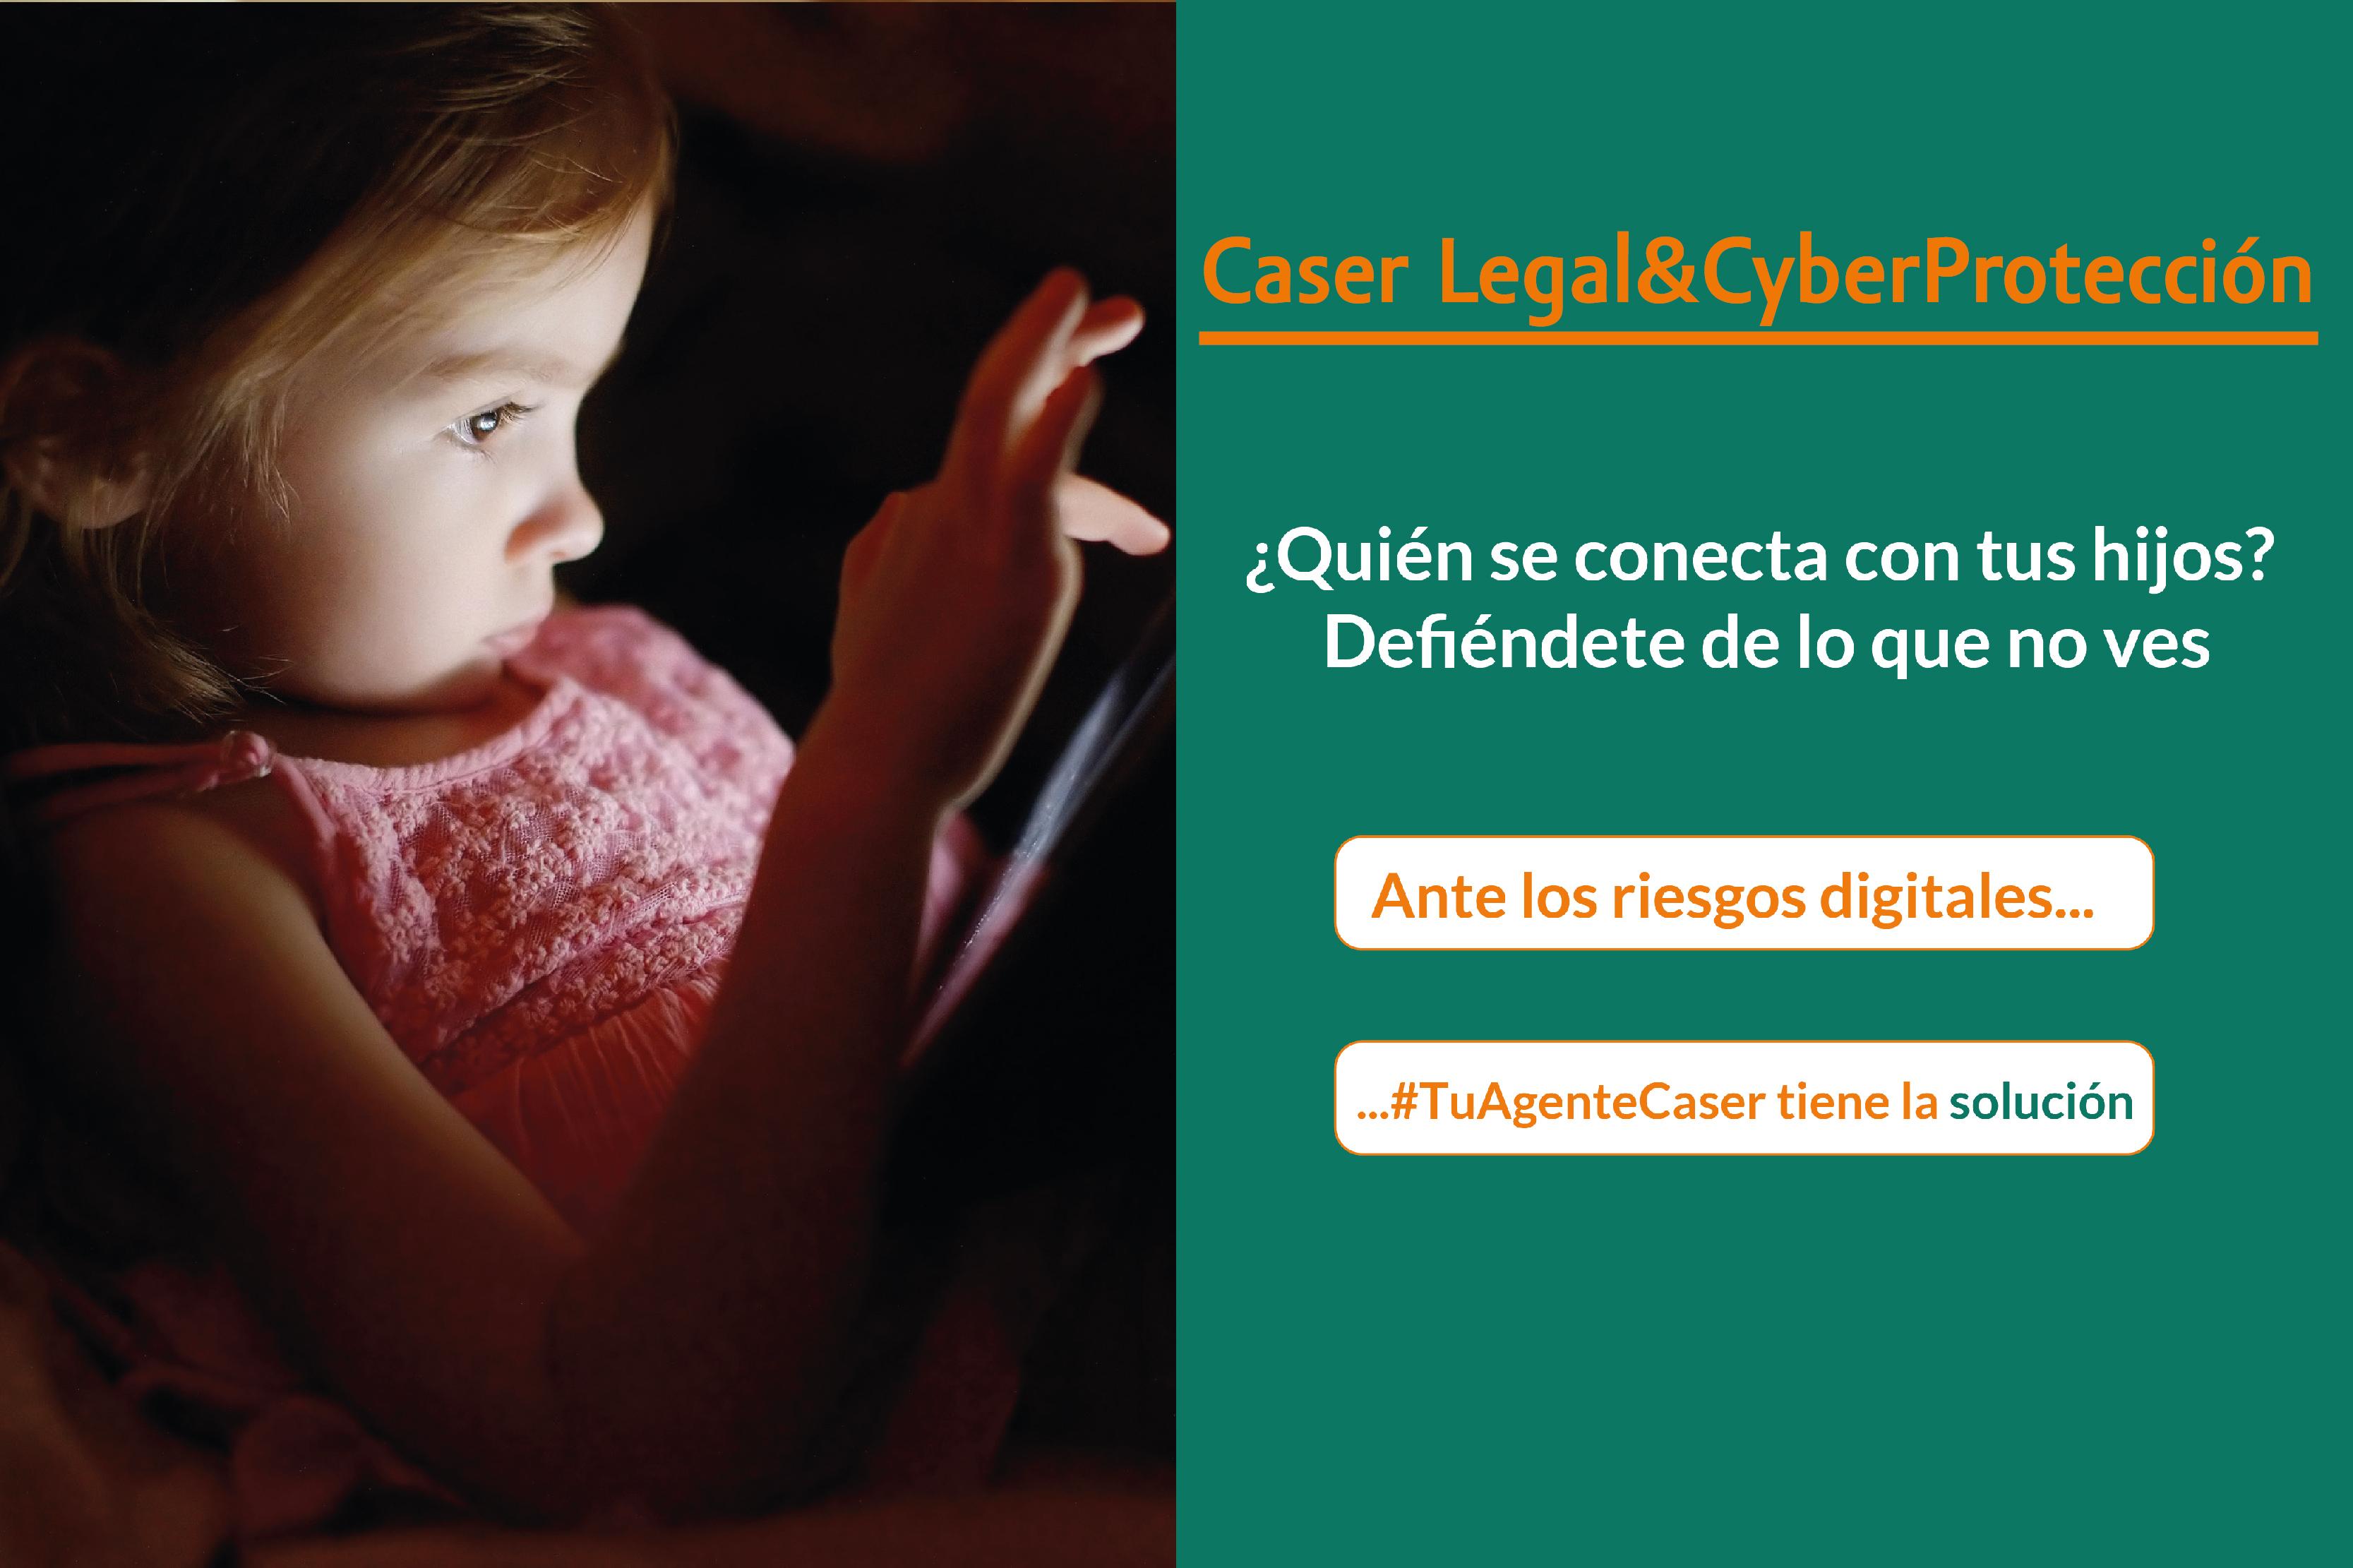 Caser Legal Cyber